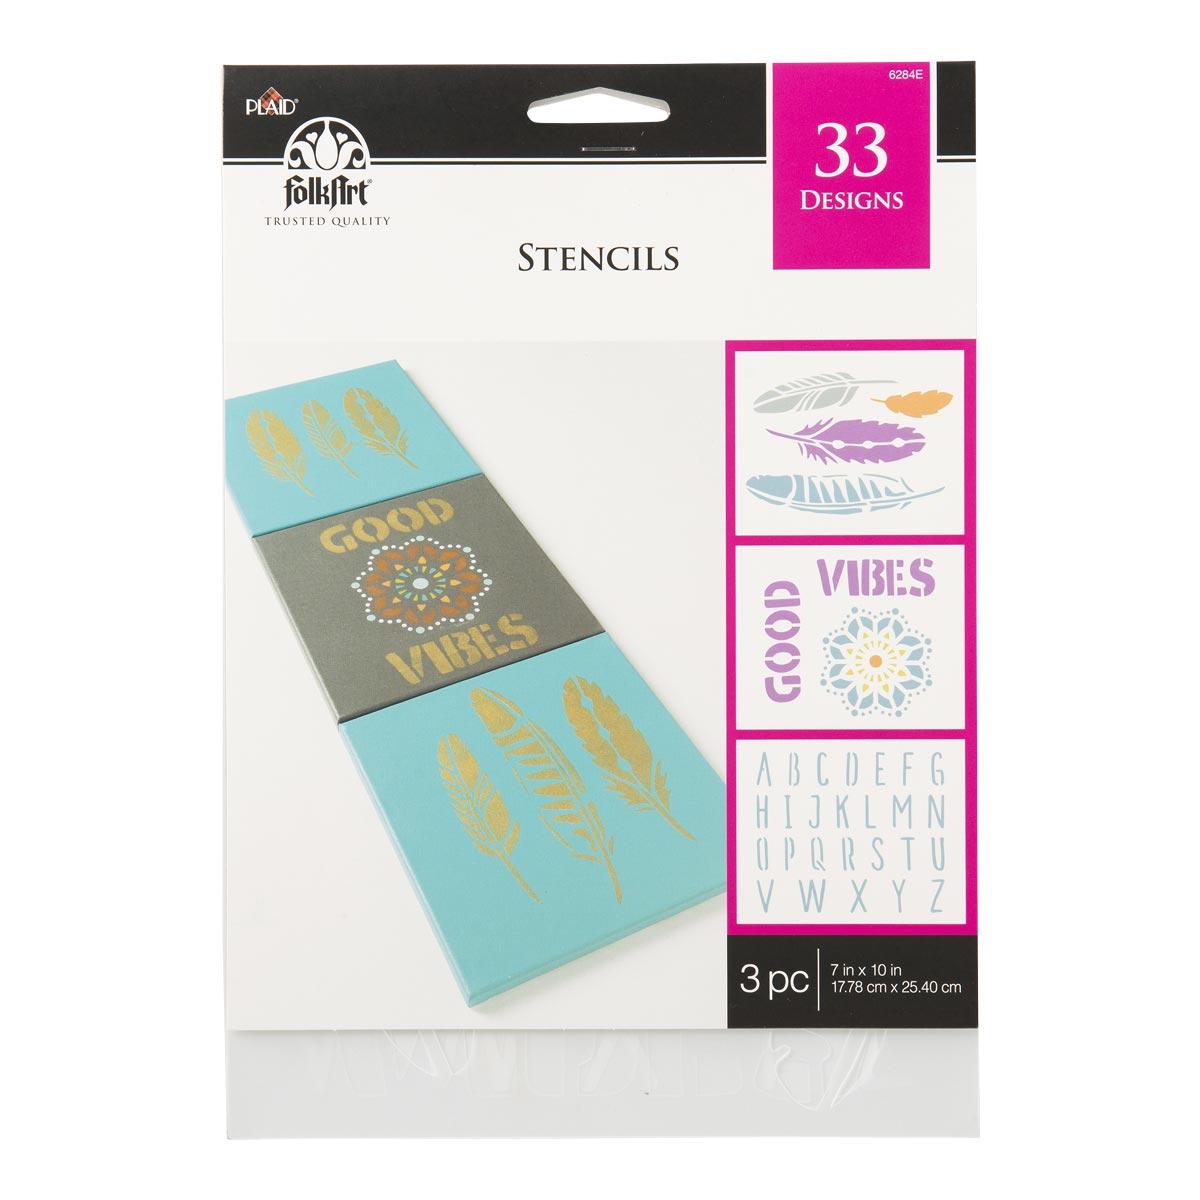 FolkArt ® Stencil Value Packs - Bohemian, 7